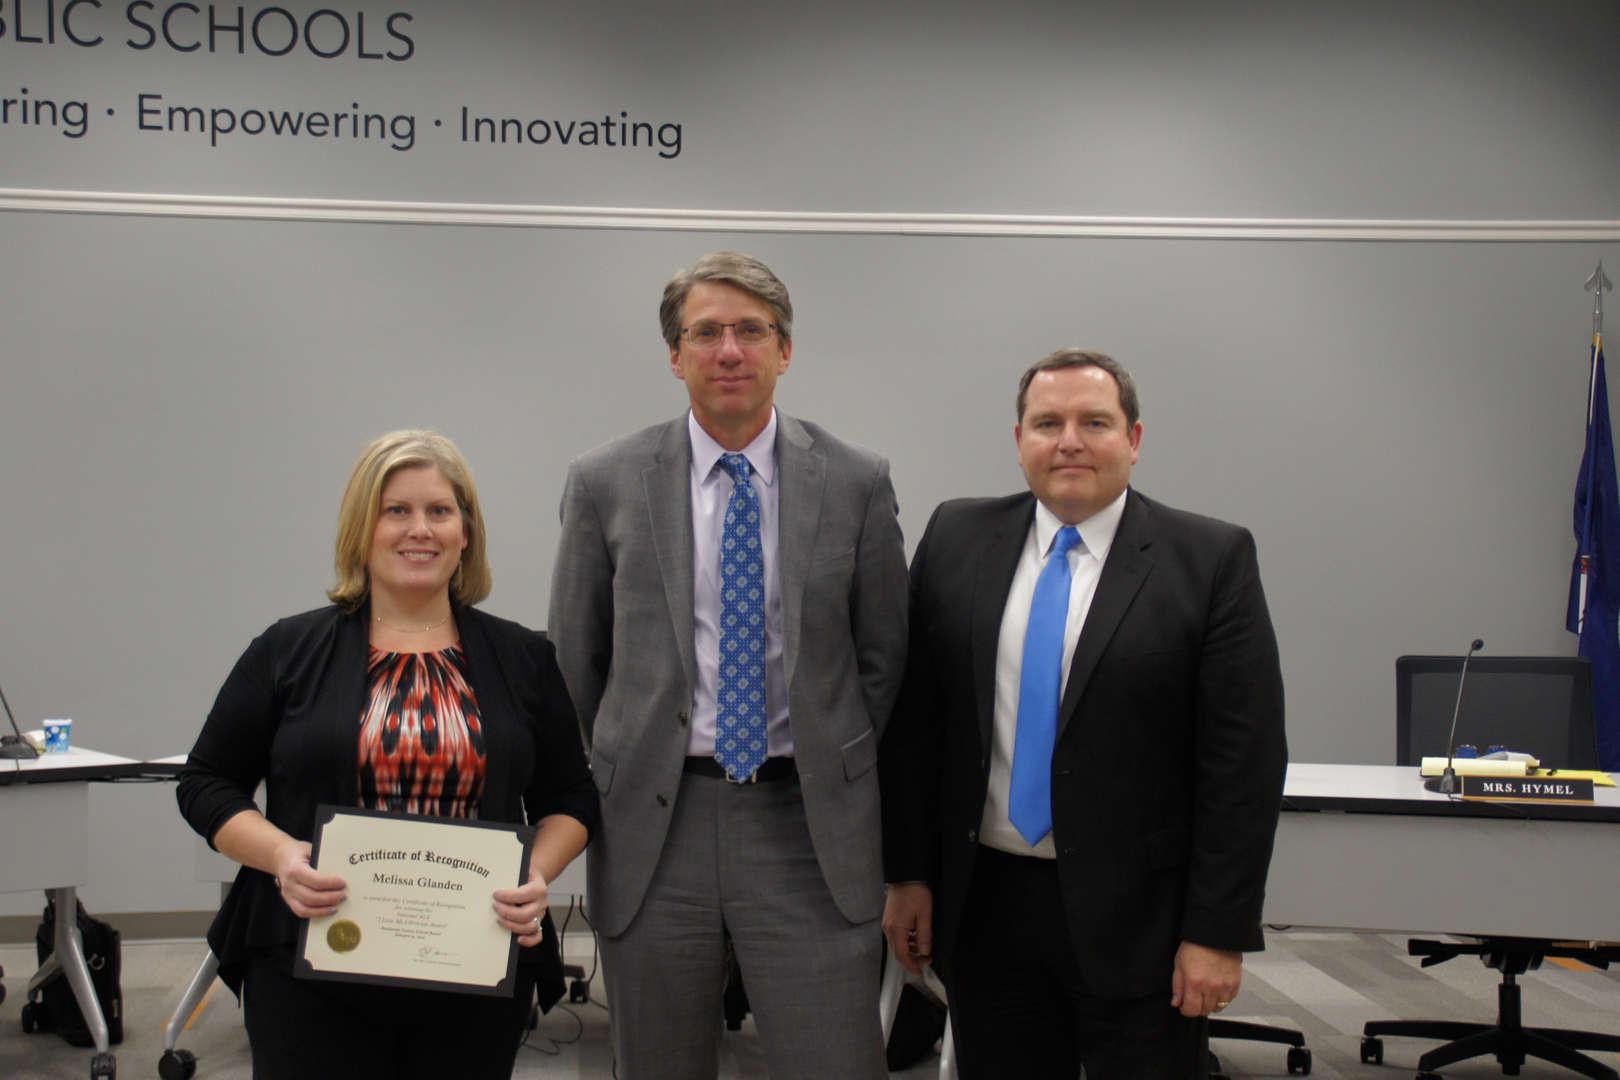 Melissa Glanden receives I Love My Librarian award